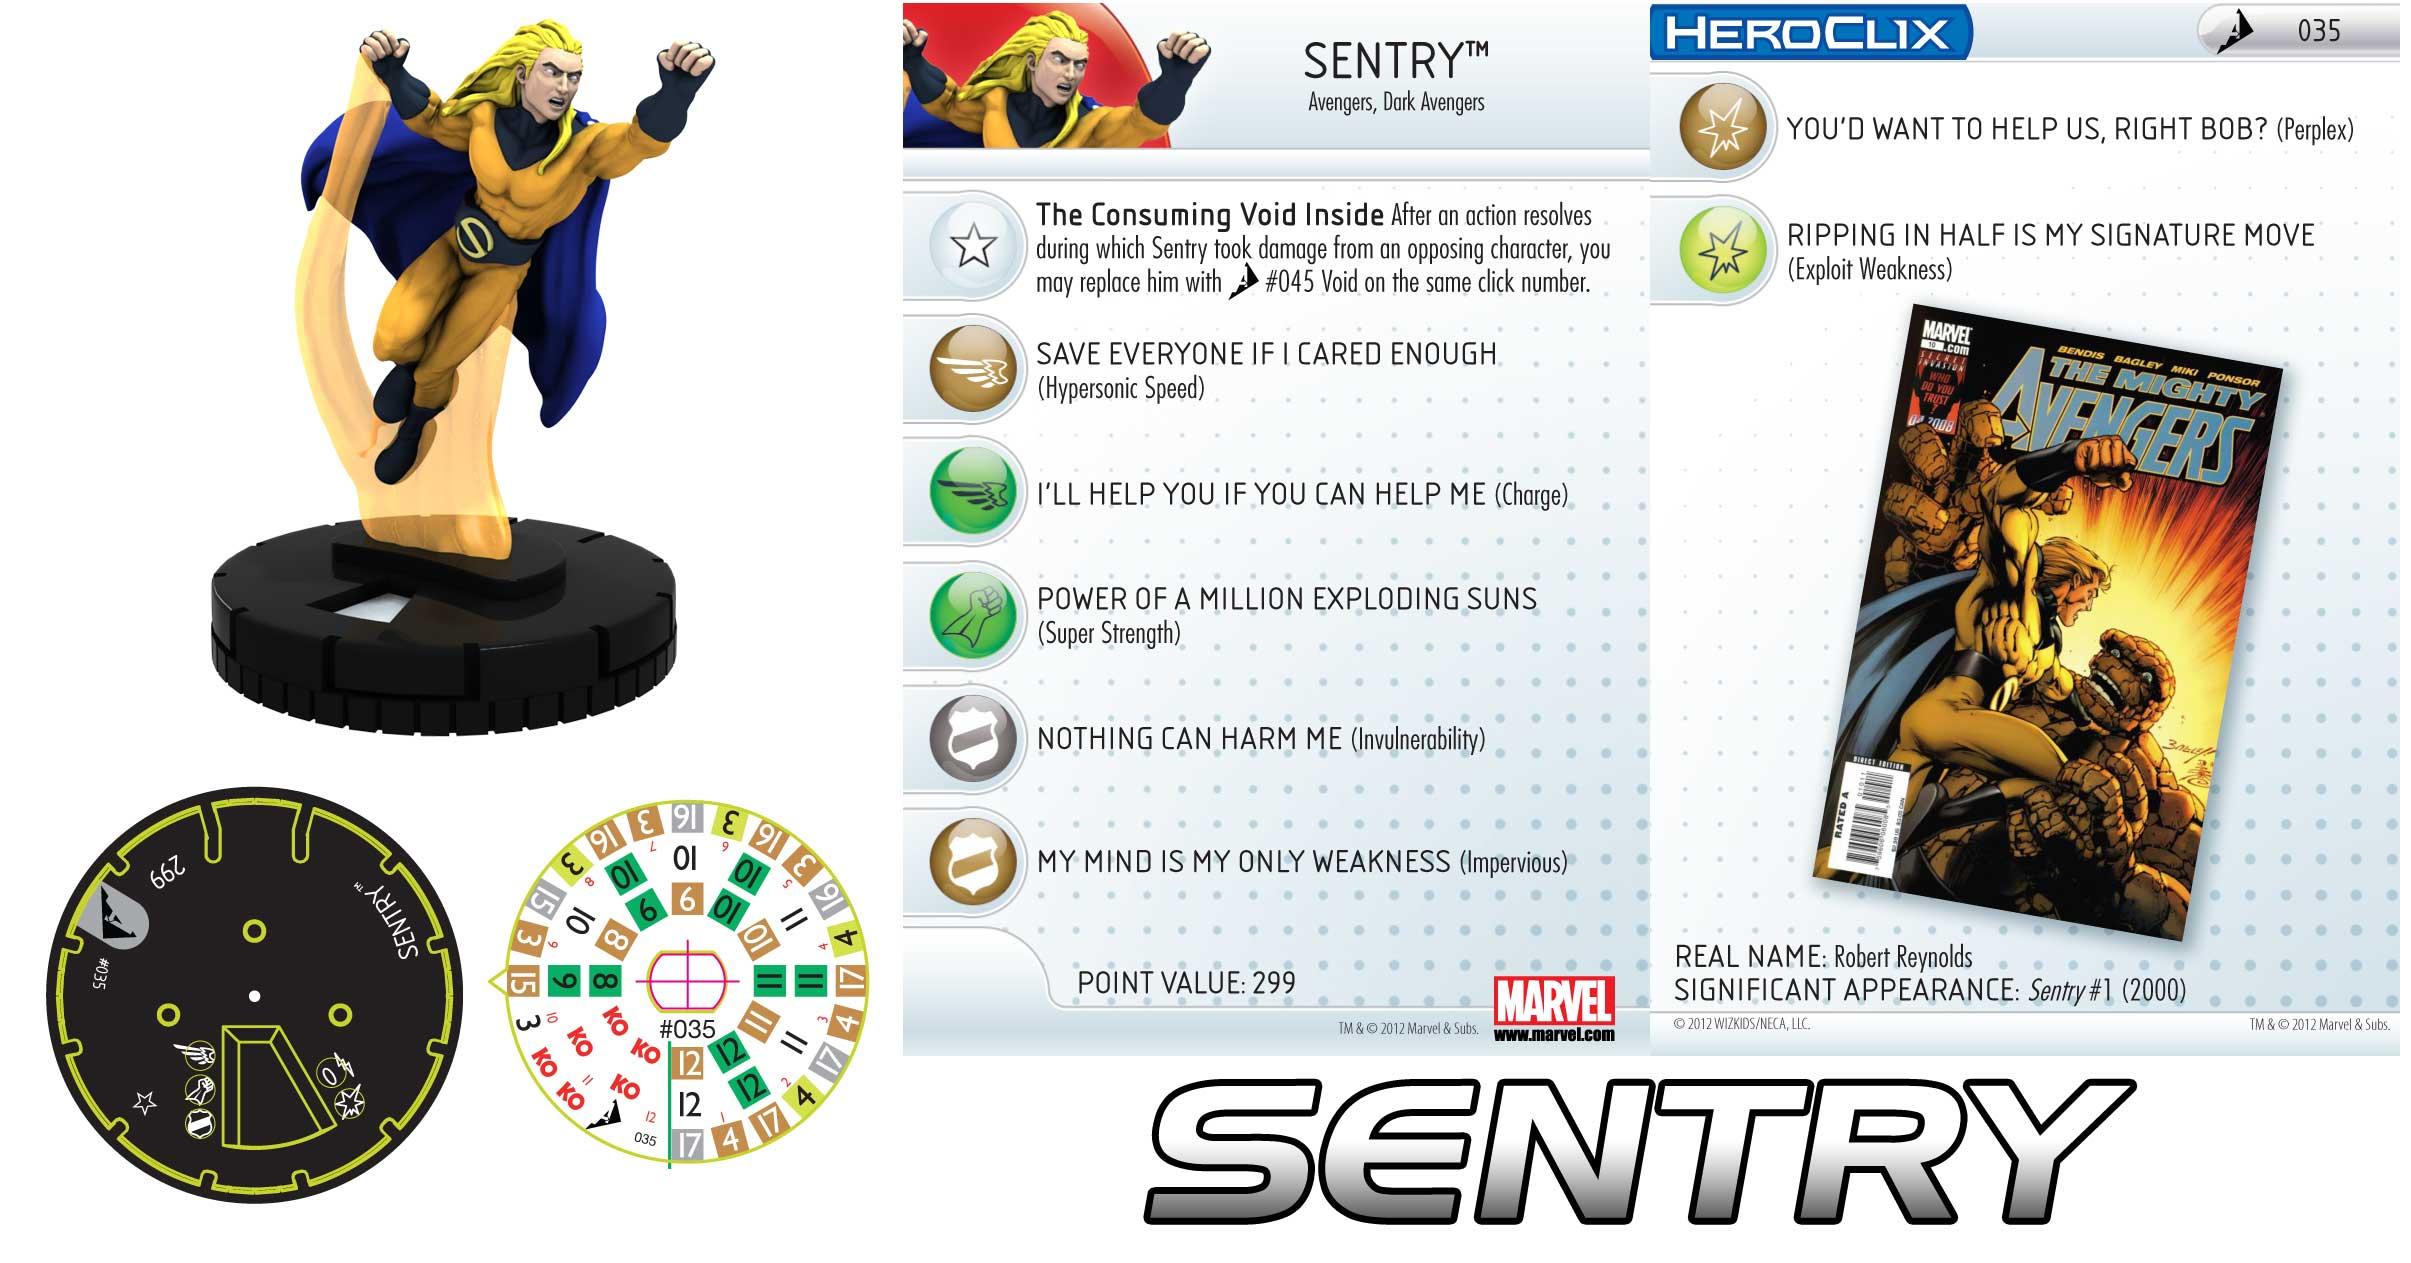 Heroclix Sentry